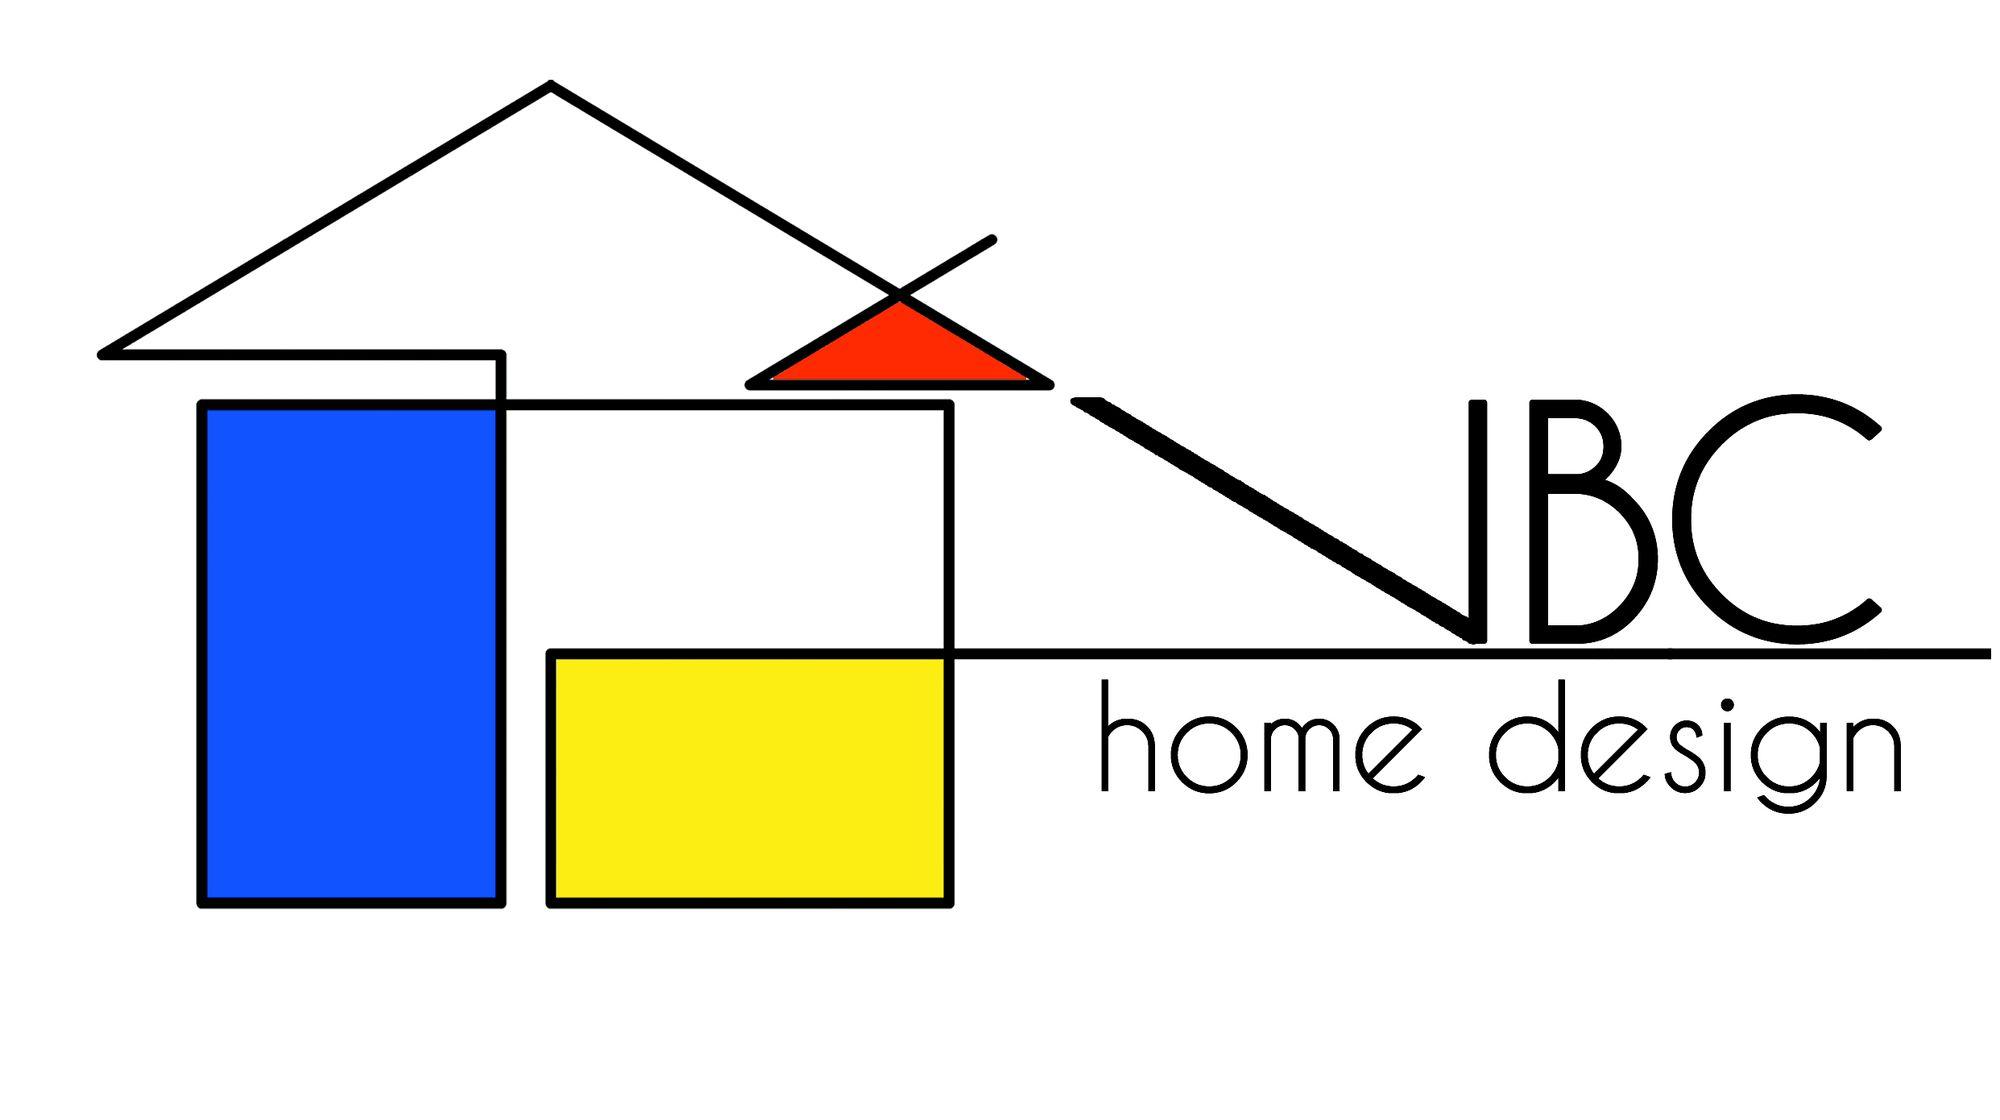 vbc home design